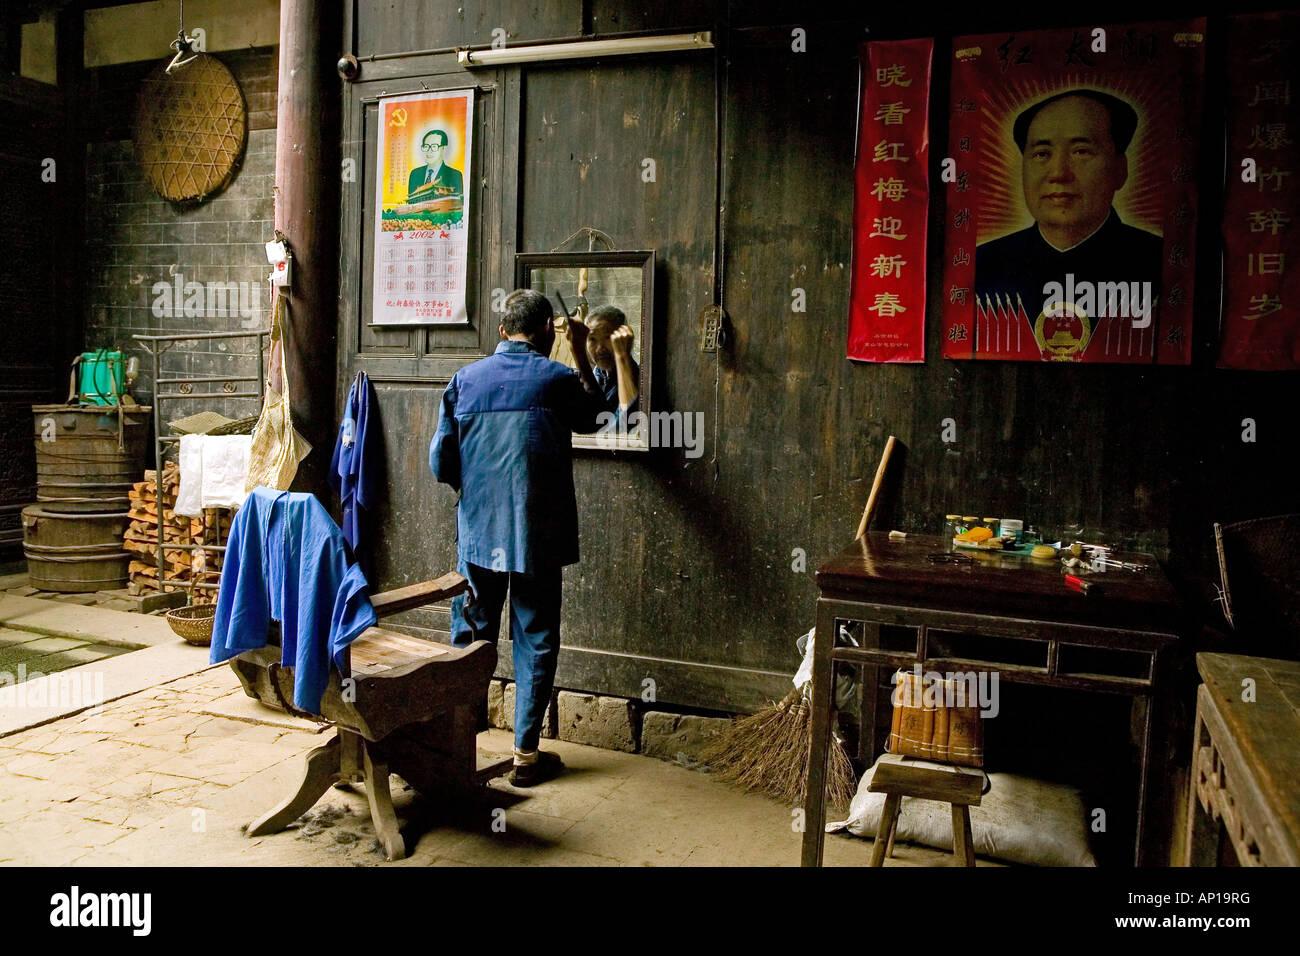 village barber, Mao portrait, courtyard of timber house in Chengkan, ancient village, living museum, Chengkan near - Stock Image